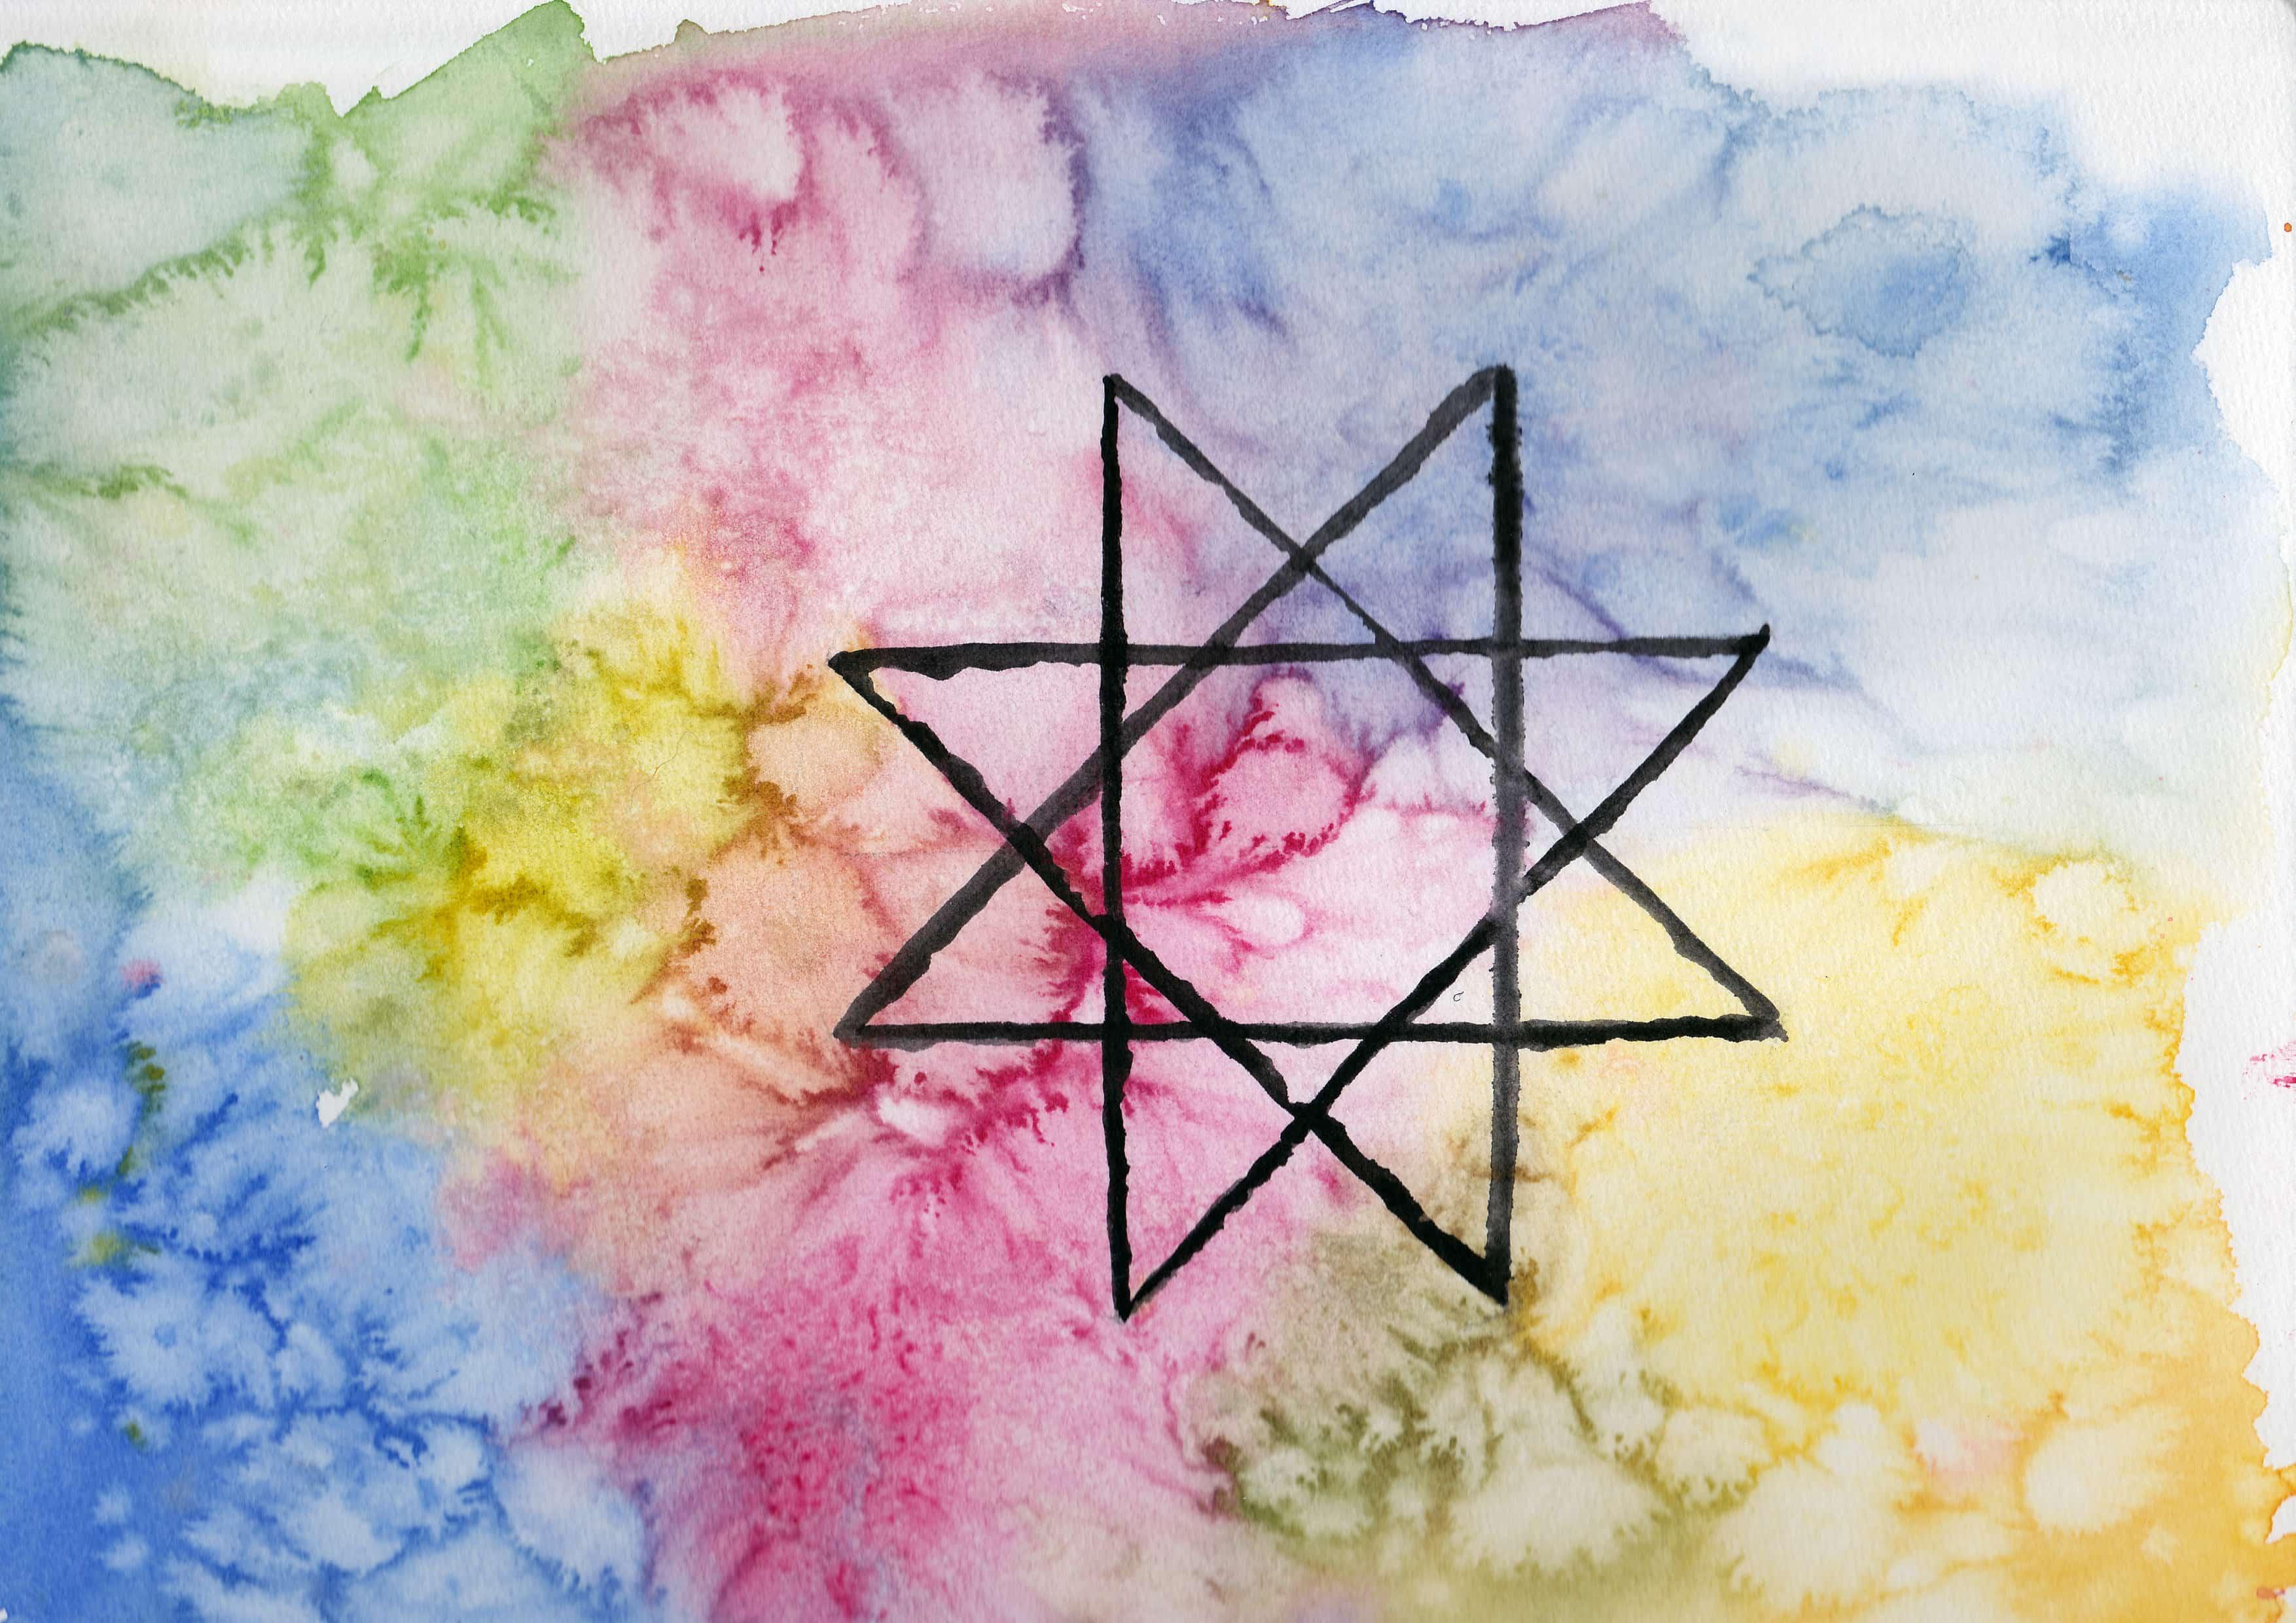 Ogdoad - 100 Hellige Symboler av Linda Ursin